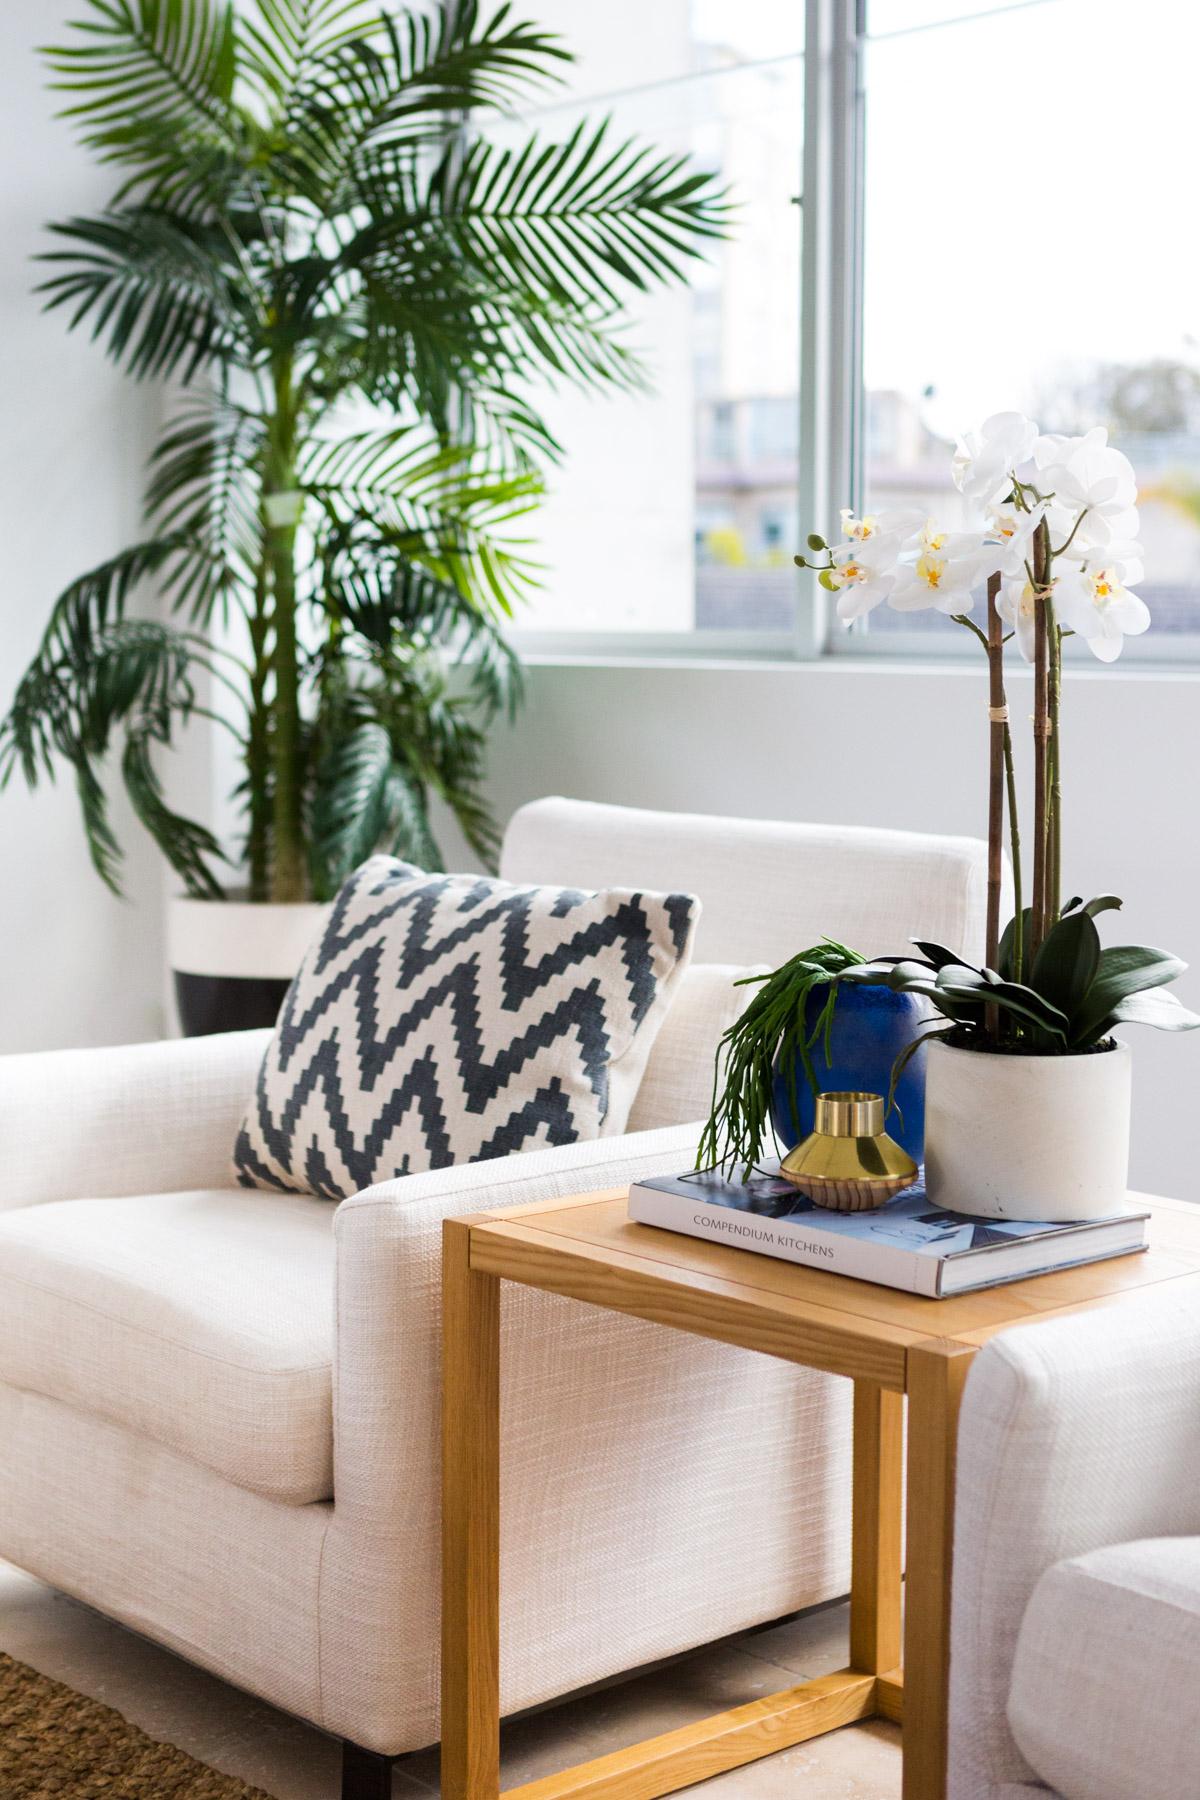 Living Room (Lounge) Styling Ideas - Advantage Property ...